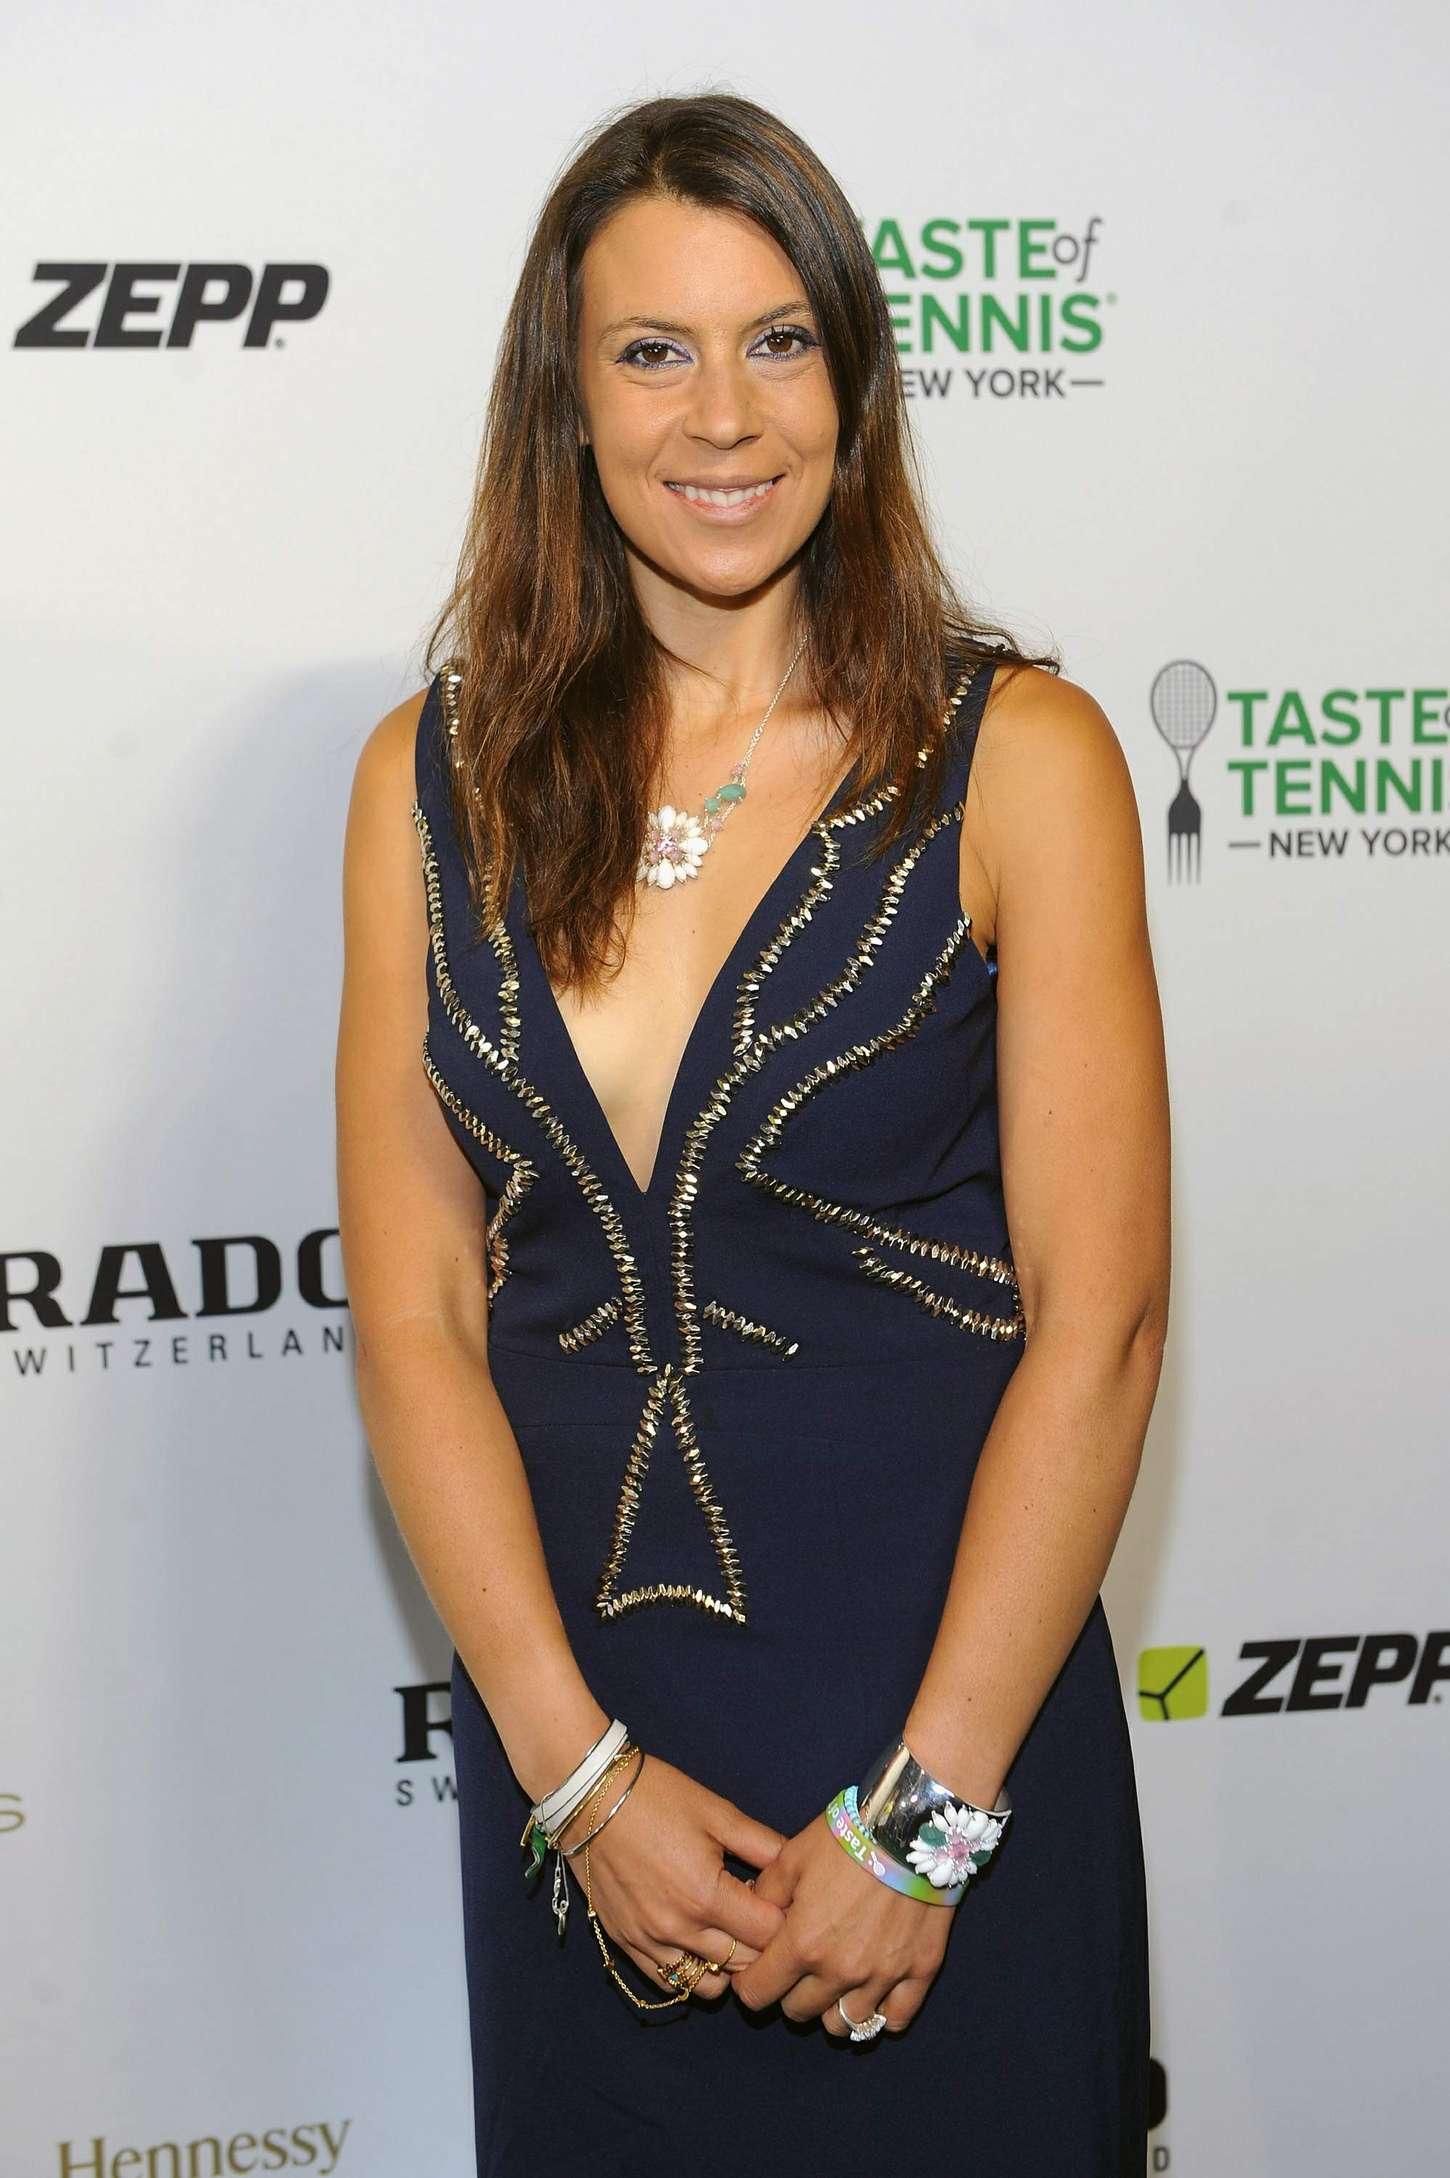 Marion Bartoli Taste of Tennis Gala in New York